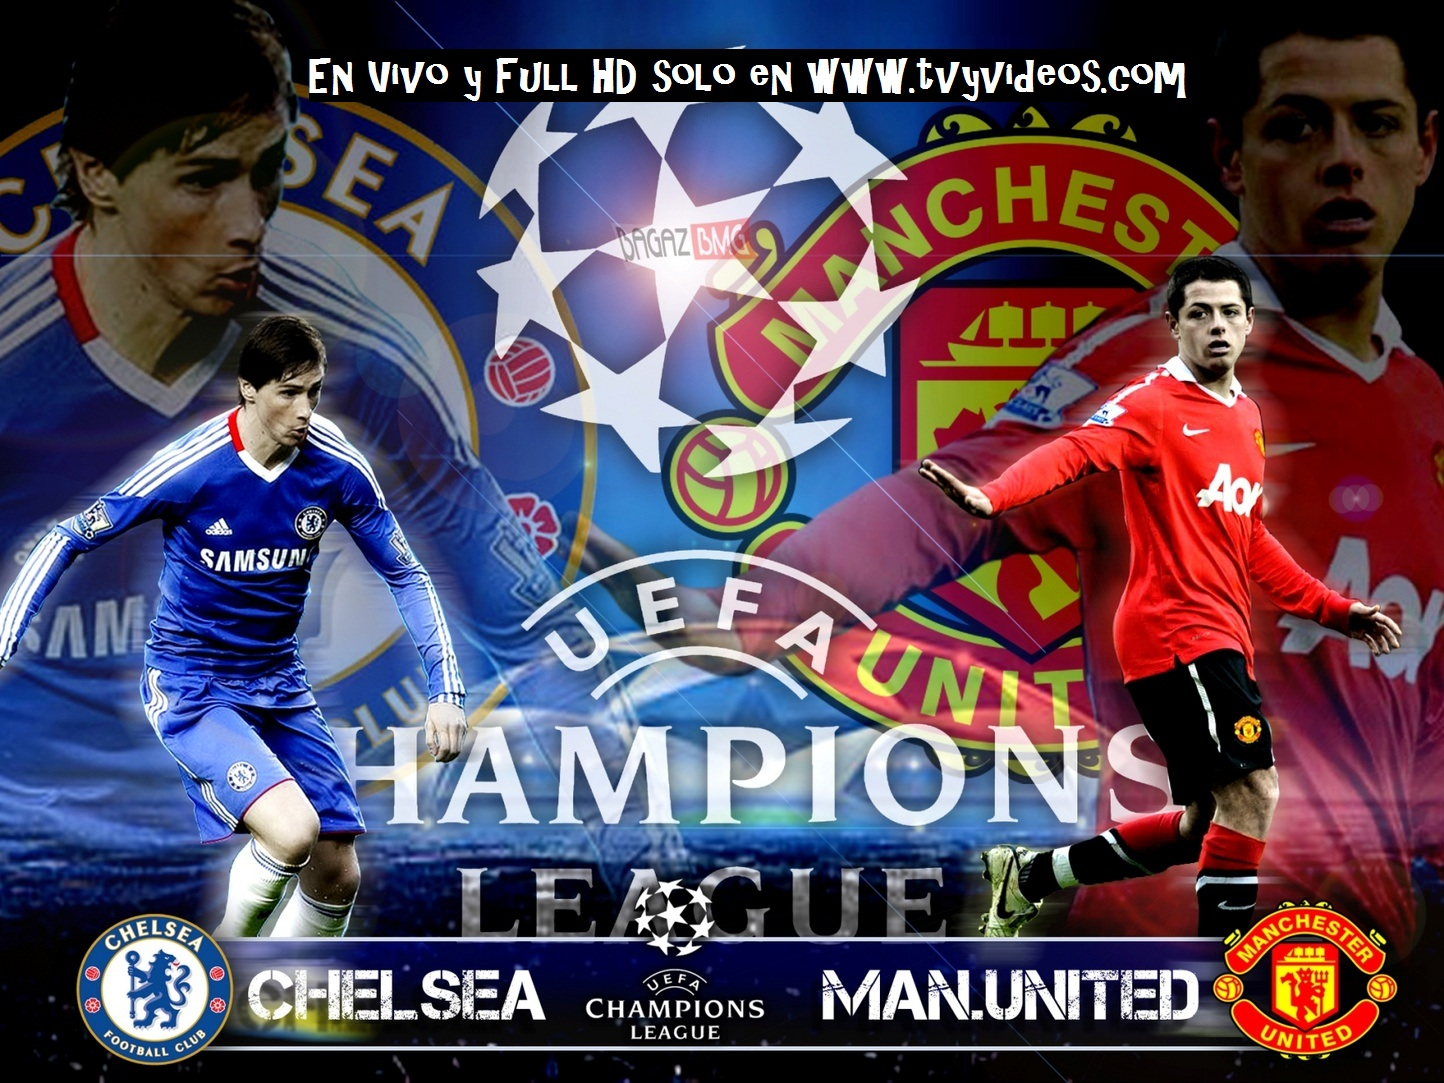 Image Result For Ver Manchester United Vs Chelsea En Vivo Eliminatorias Manchester United Online